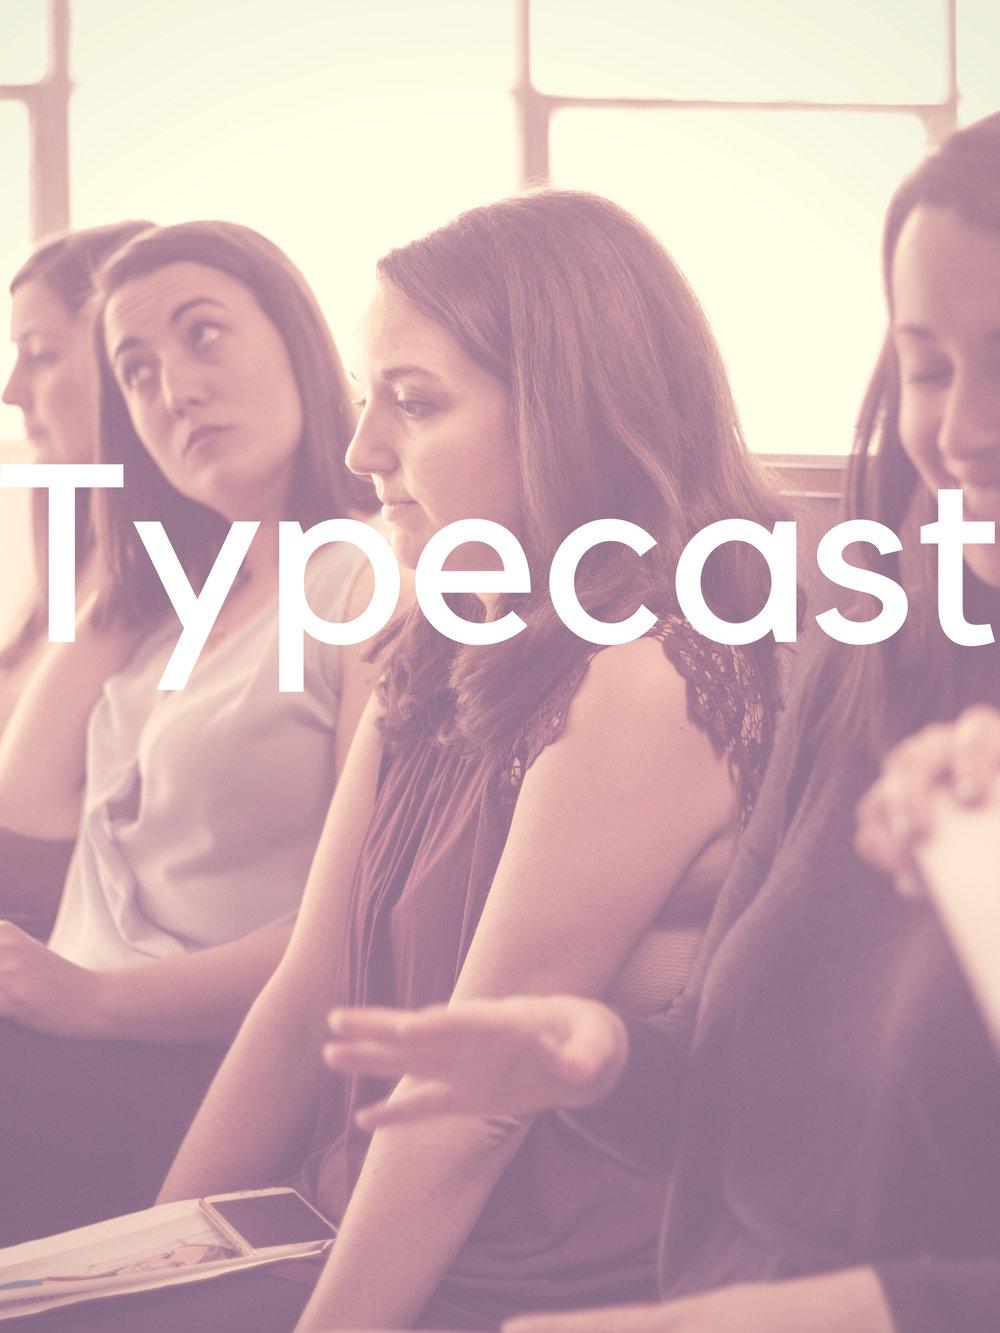 Typecast.jpg